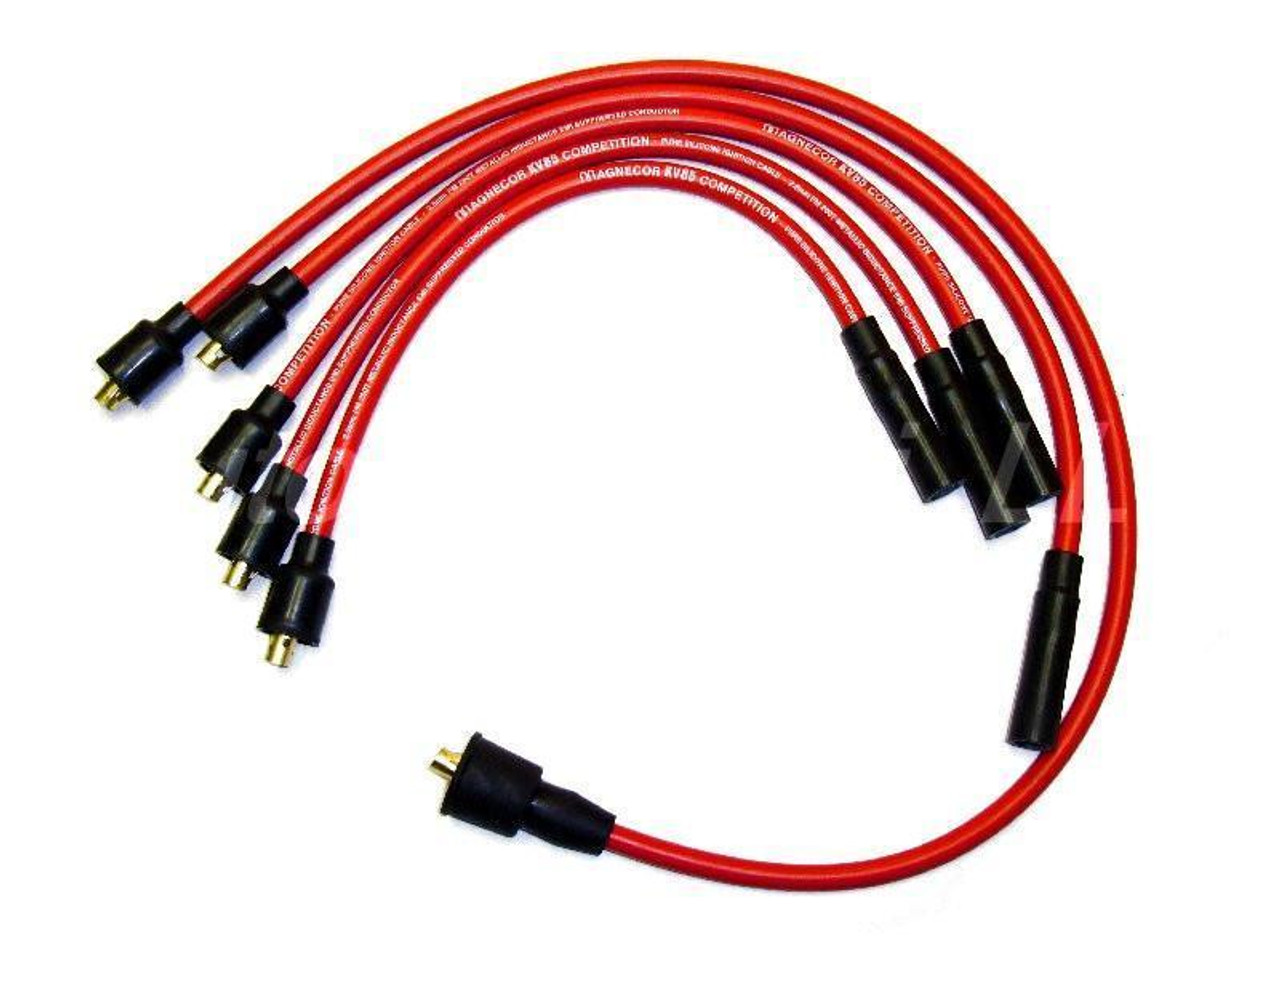 Magnecor 8.5mm High Performance Spark Plug Wires 1973-85